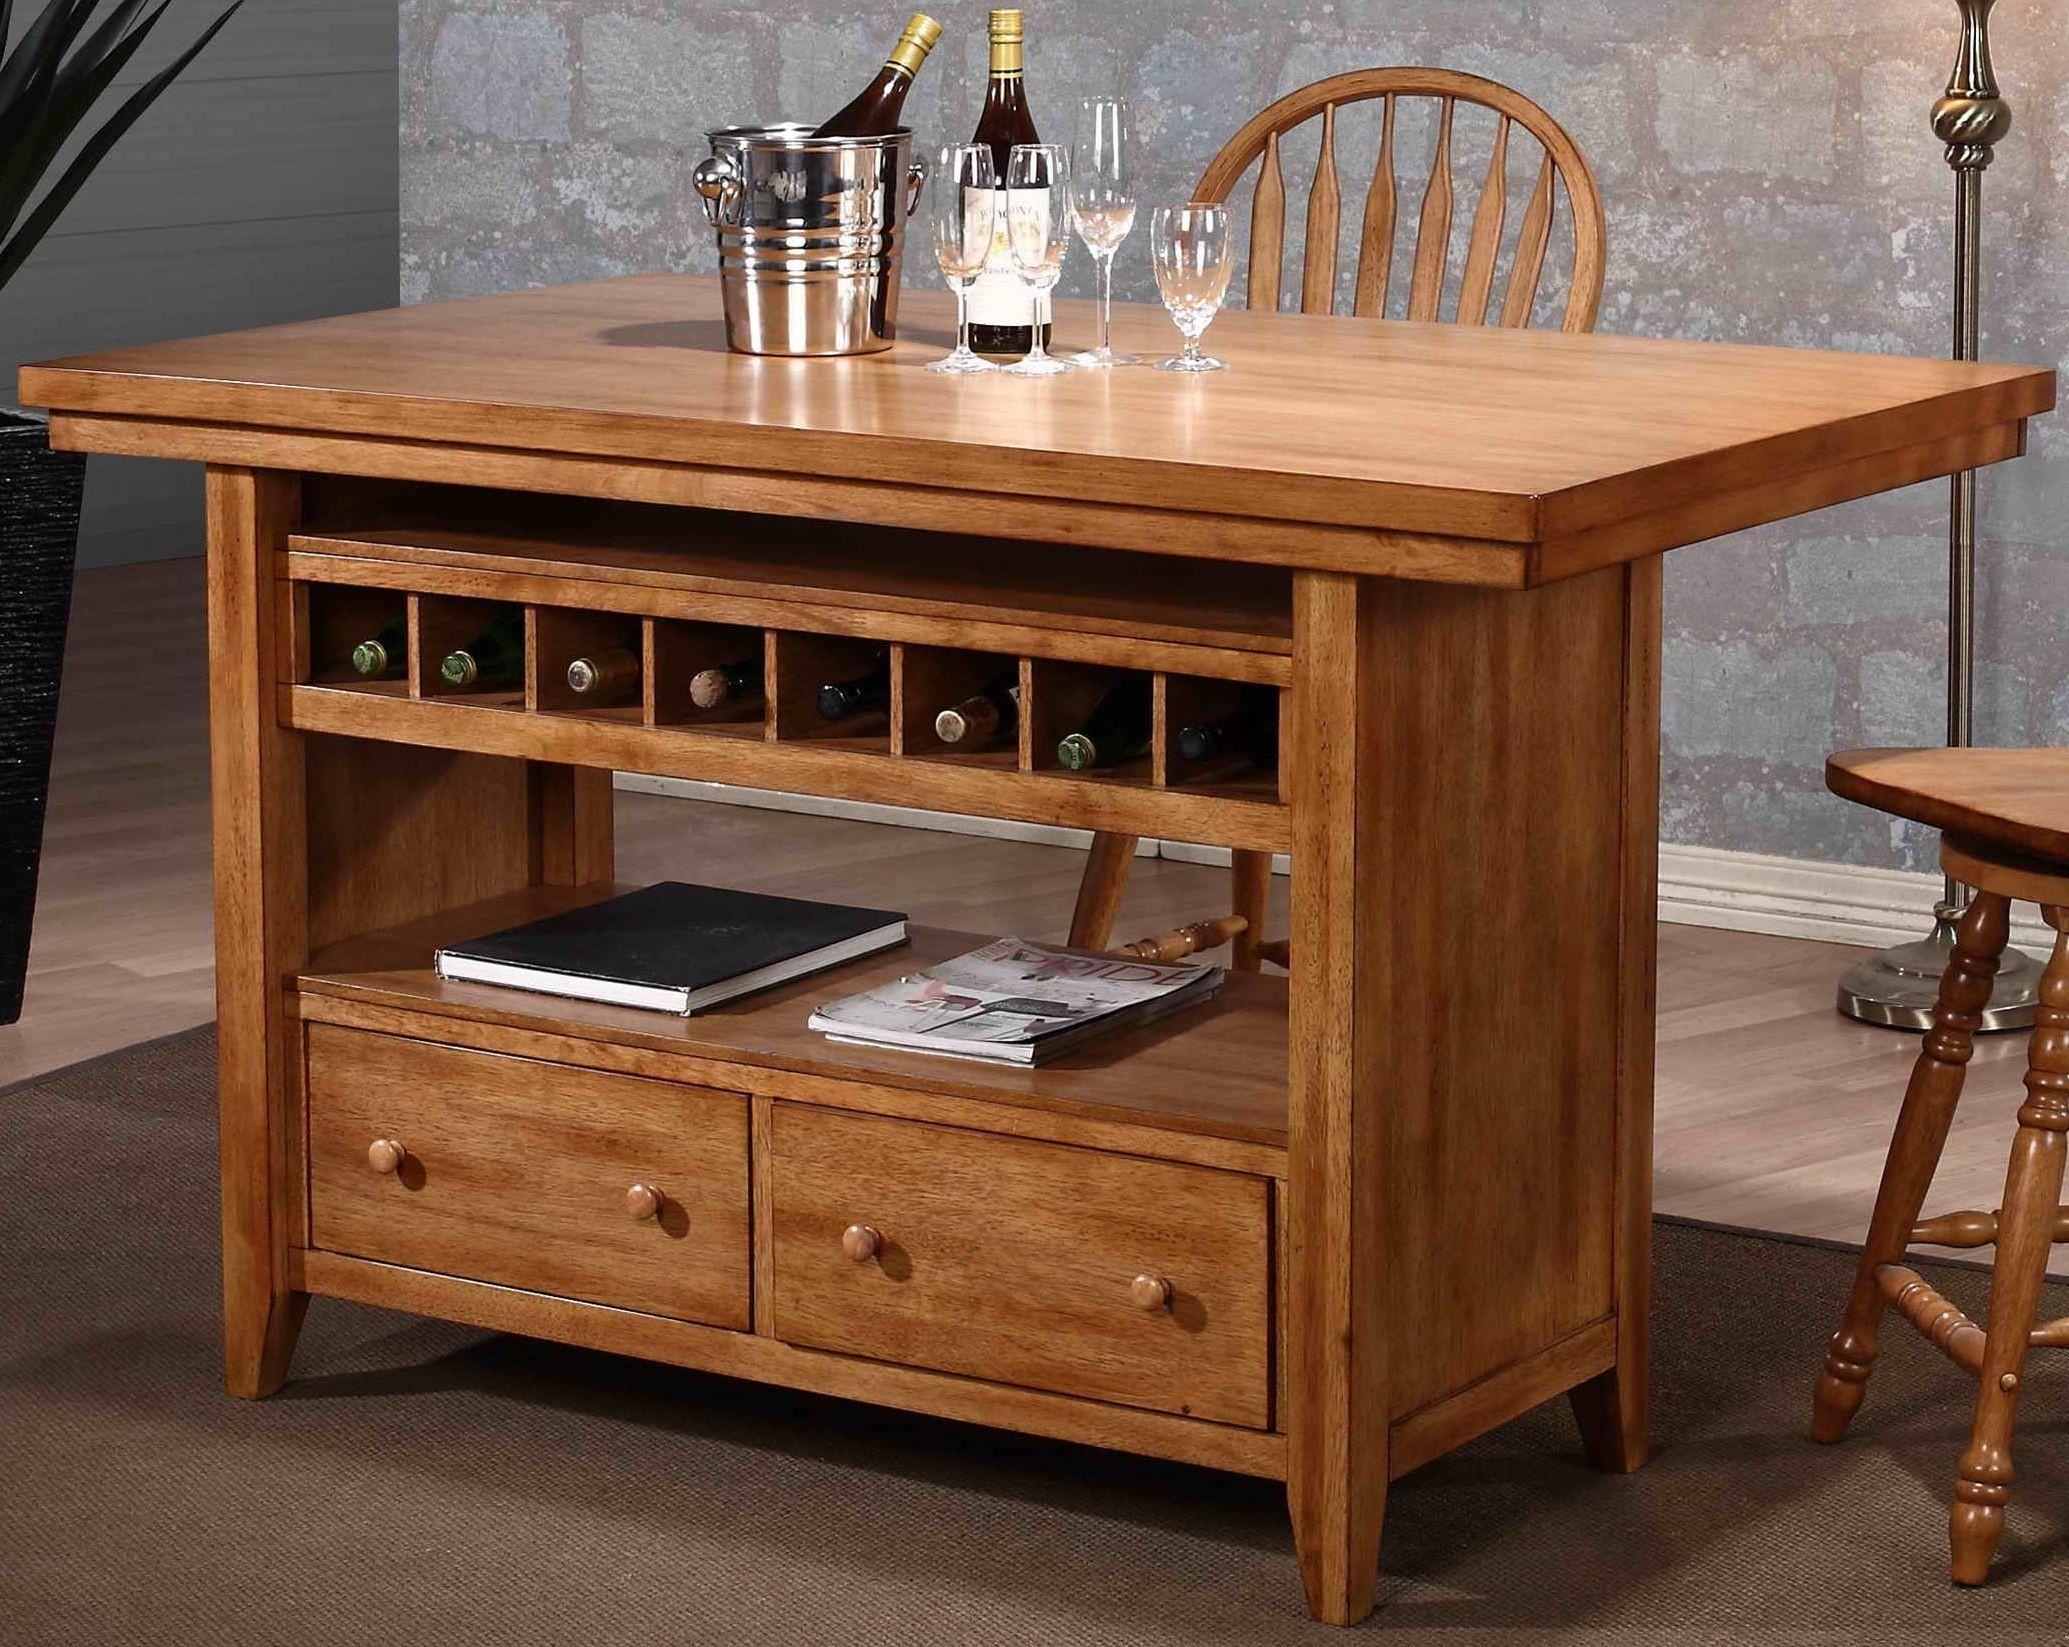 Four Seasons Rustic Oak Kitchen Island From Eci Furniture Coleman Furniture